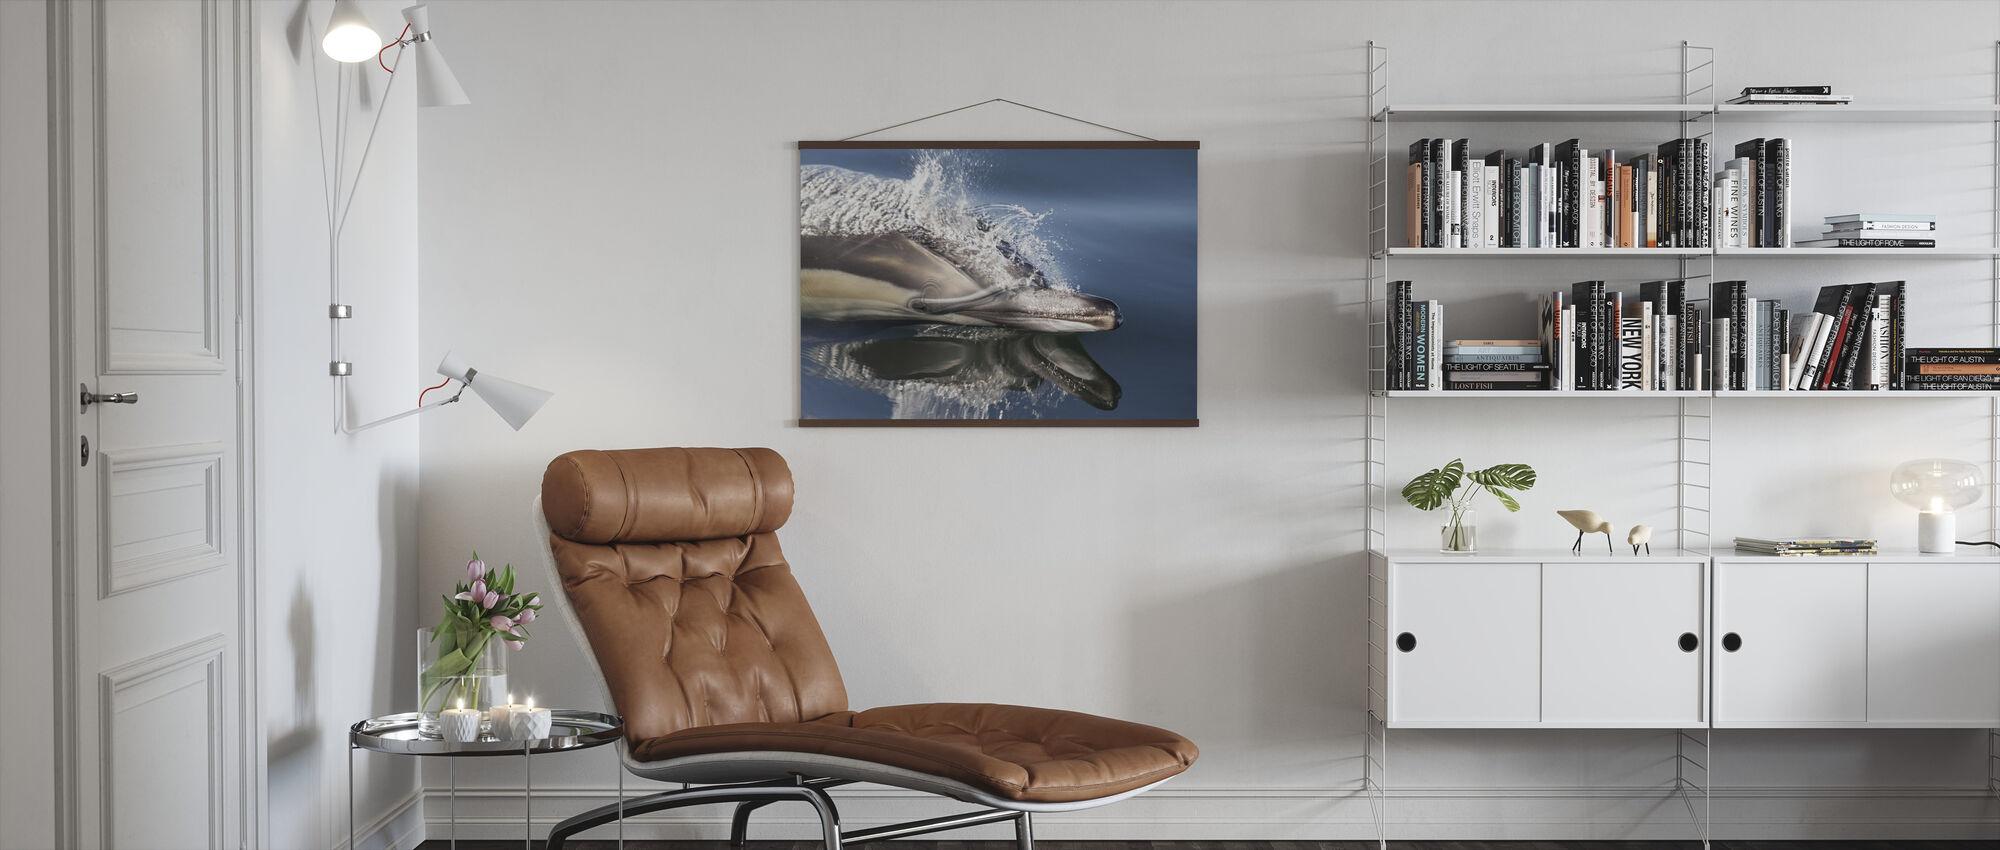 Long-beaked Dolphin - Poster - Living Room